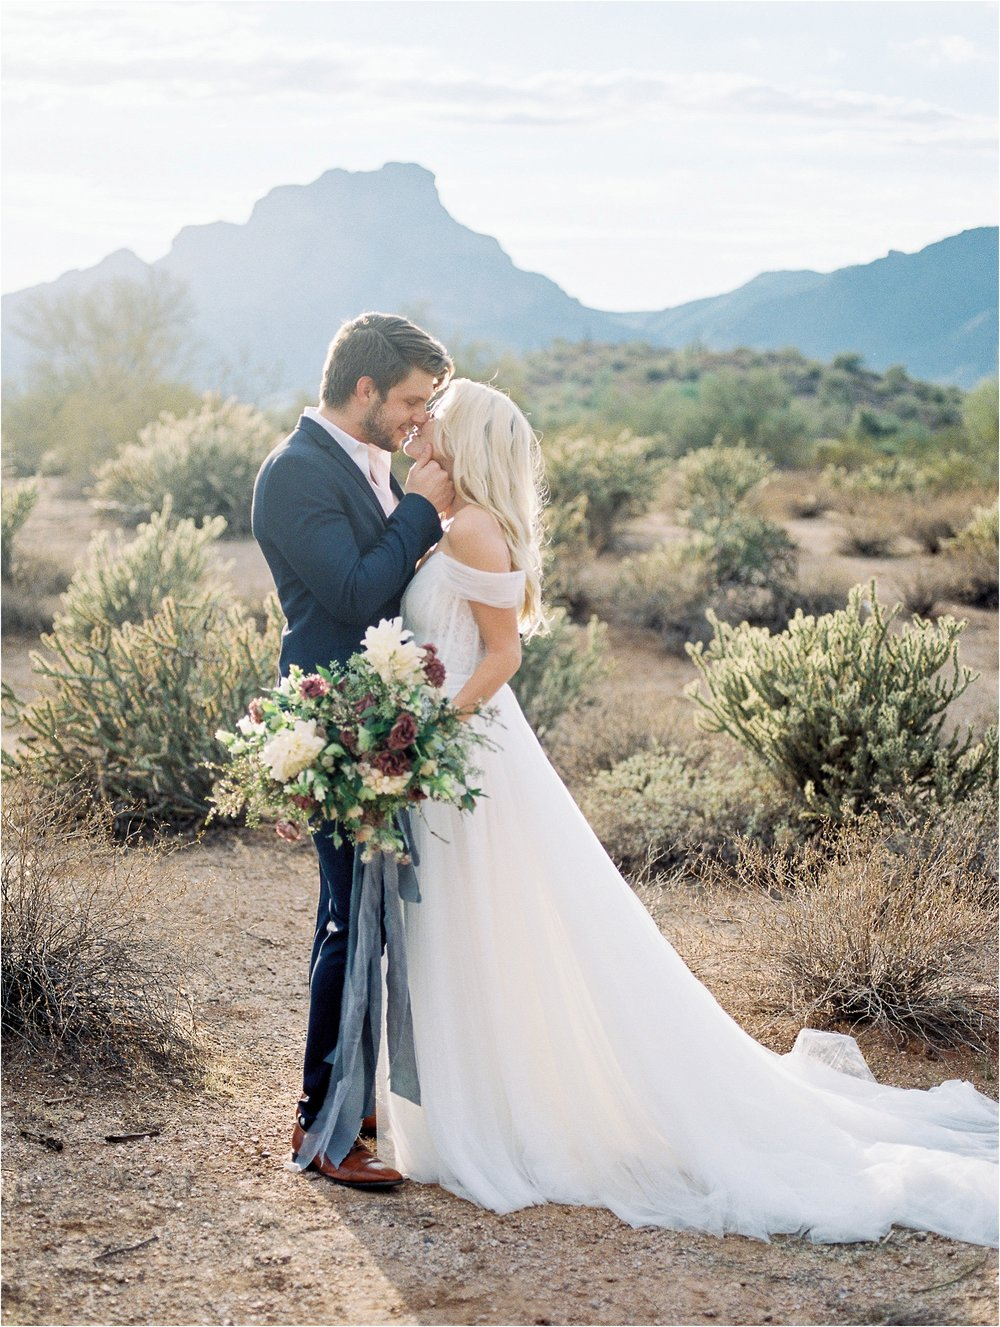 Sarah Jane Photography Fine Art film phoenix scottsdale arizona wedding portrait photogragher Unveiled day 1_0010.jpg